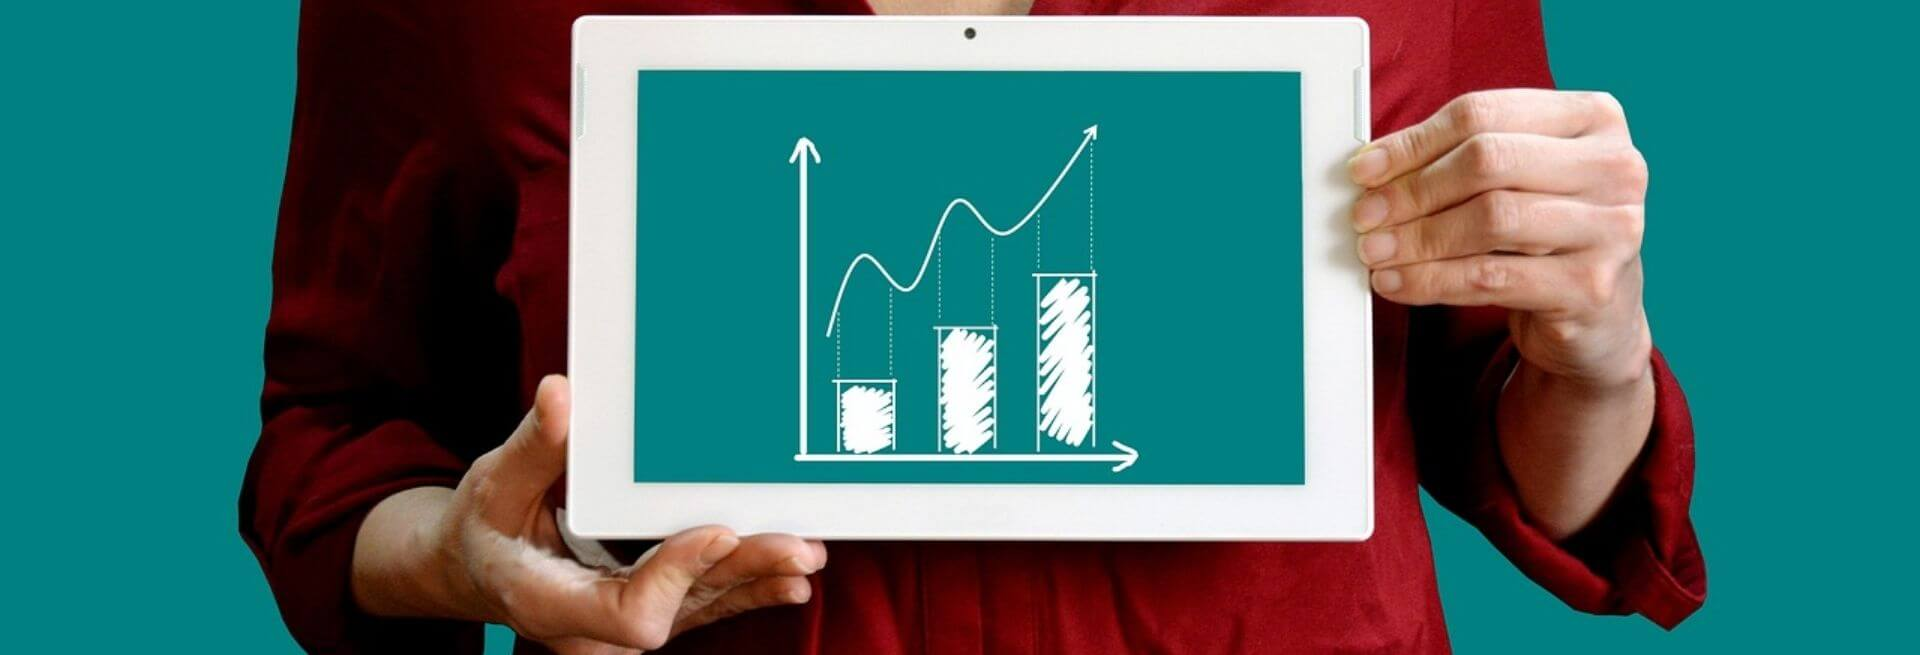 increase your ad revenue